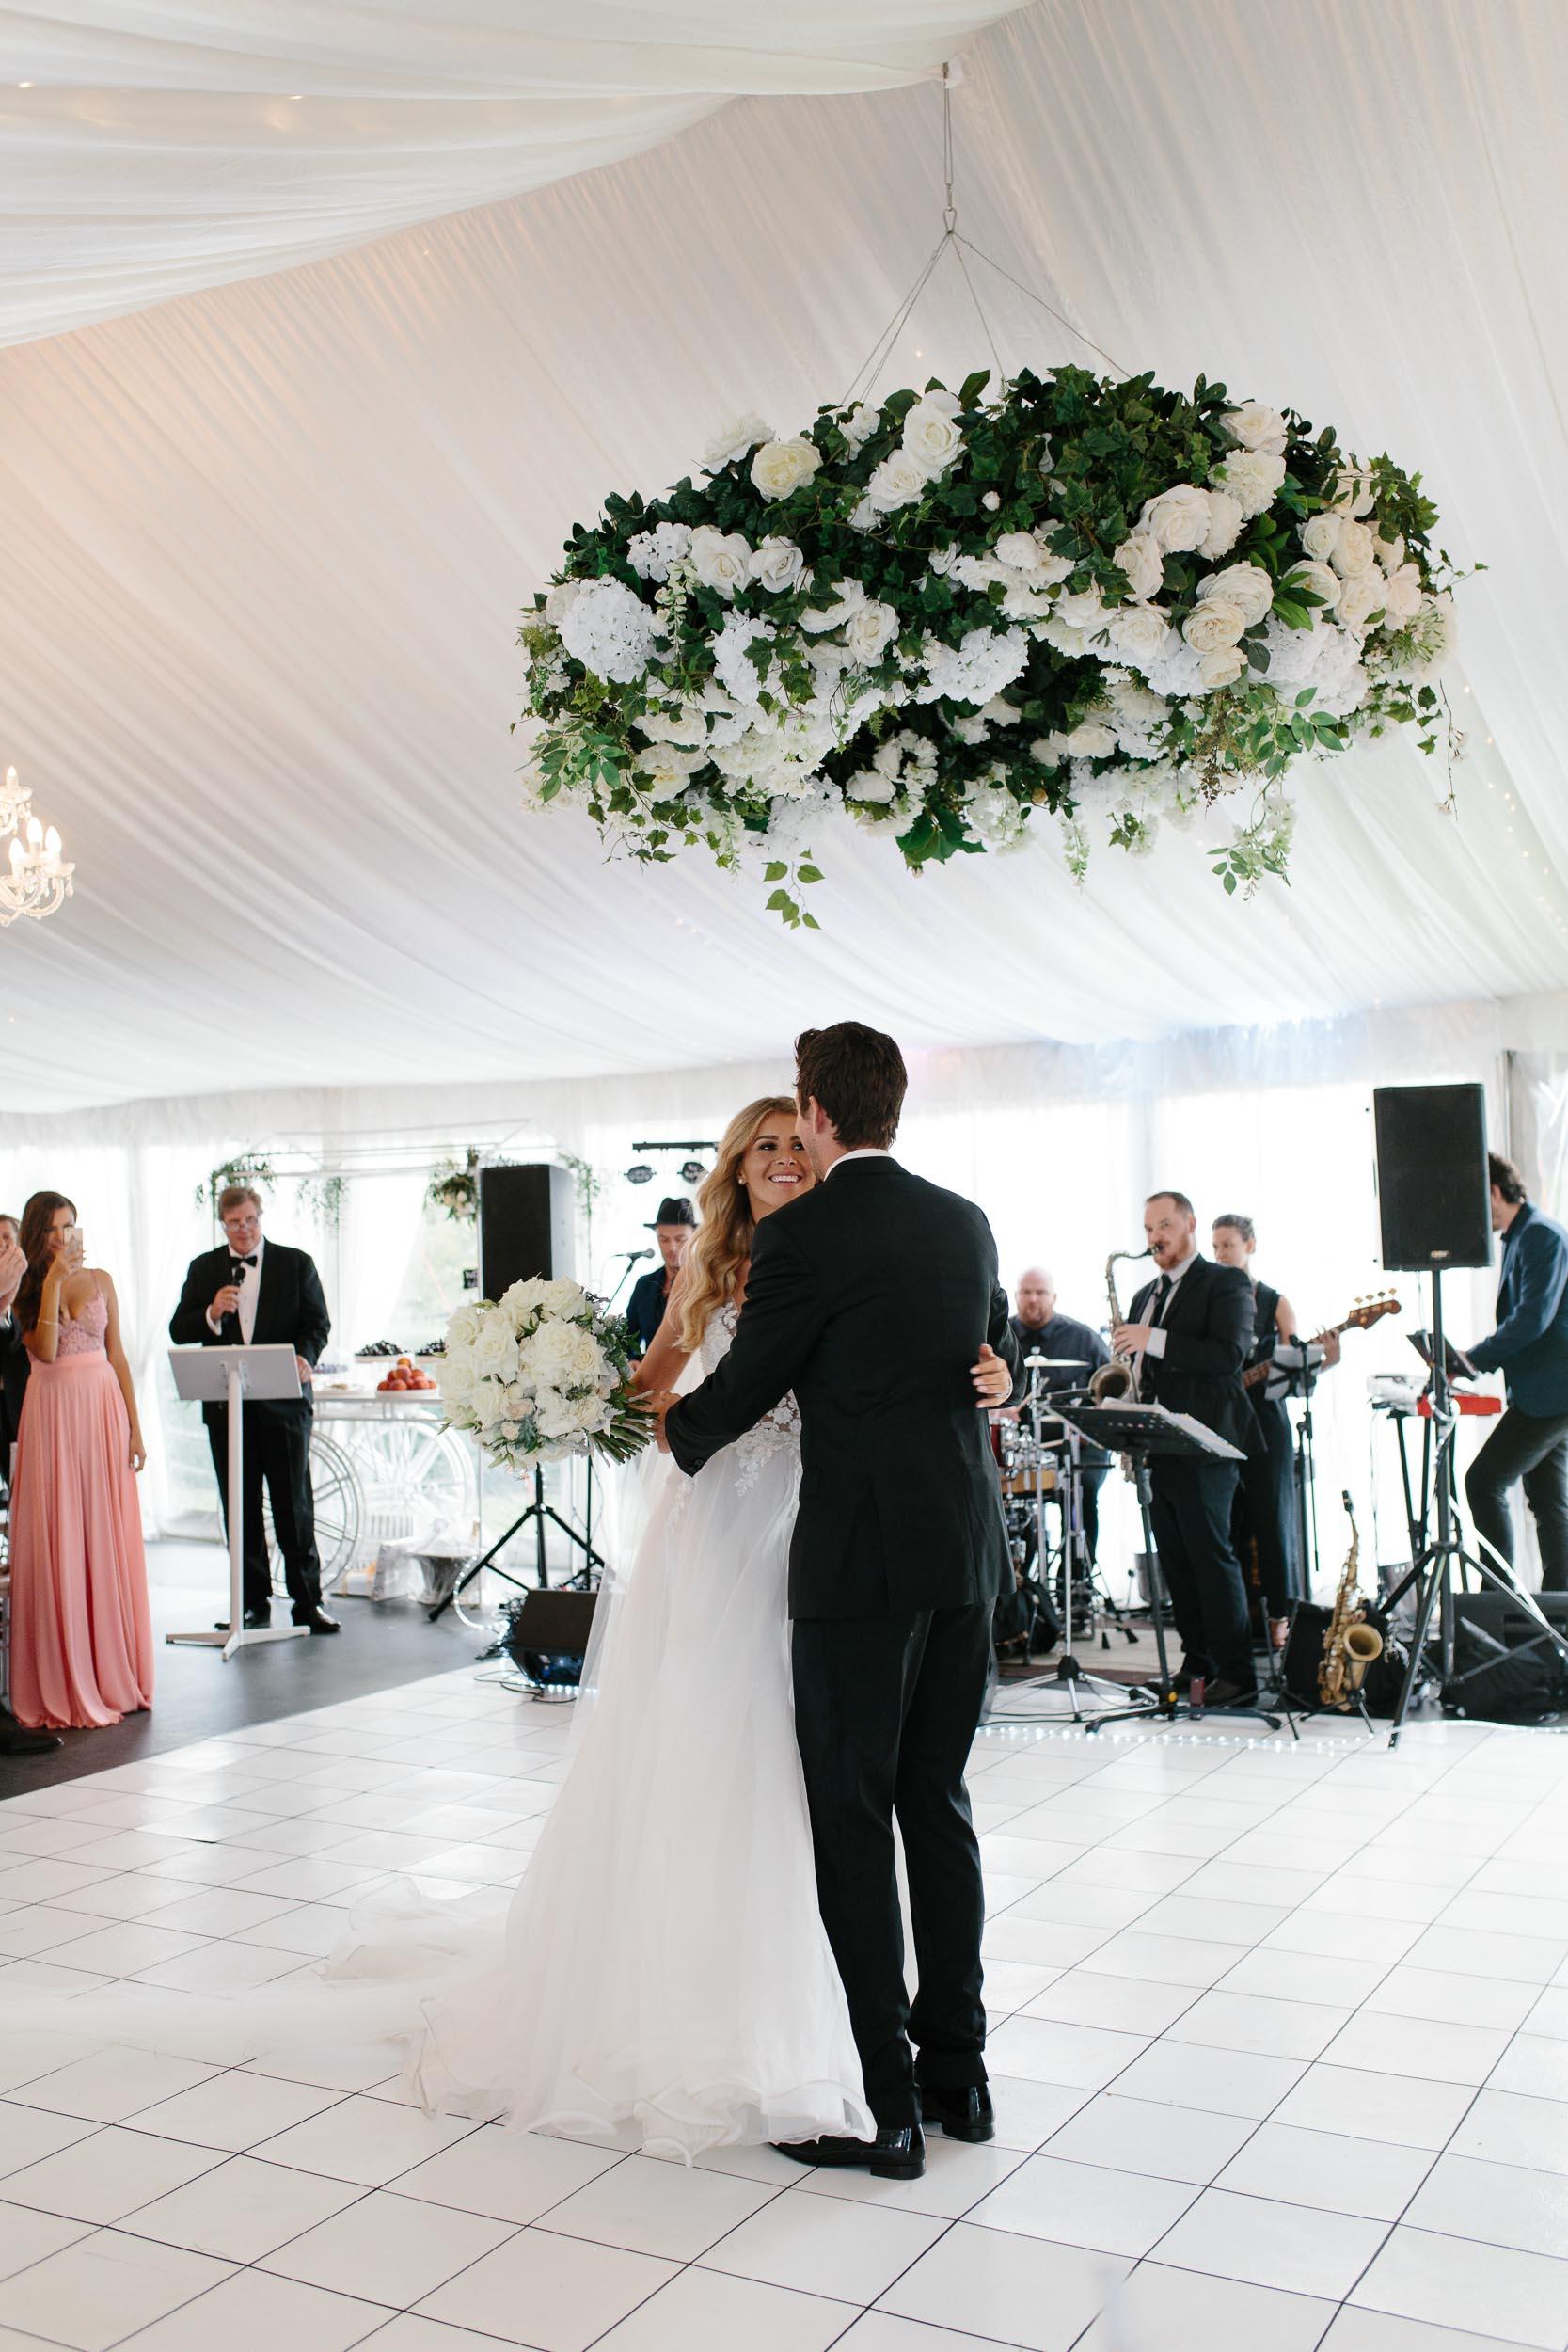 Kas-Richards-Mornington-Peninsula-Private-Property-Wedding-Marianna-Hardwick-Gown-646.jpg